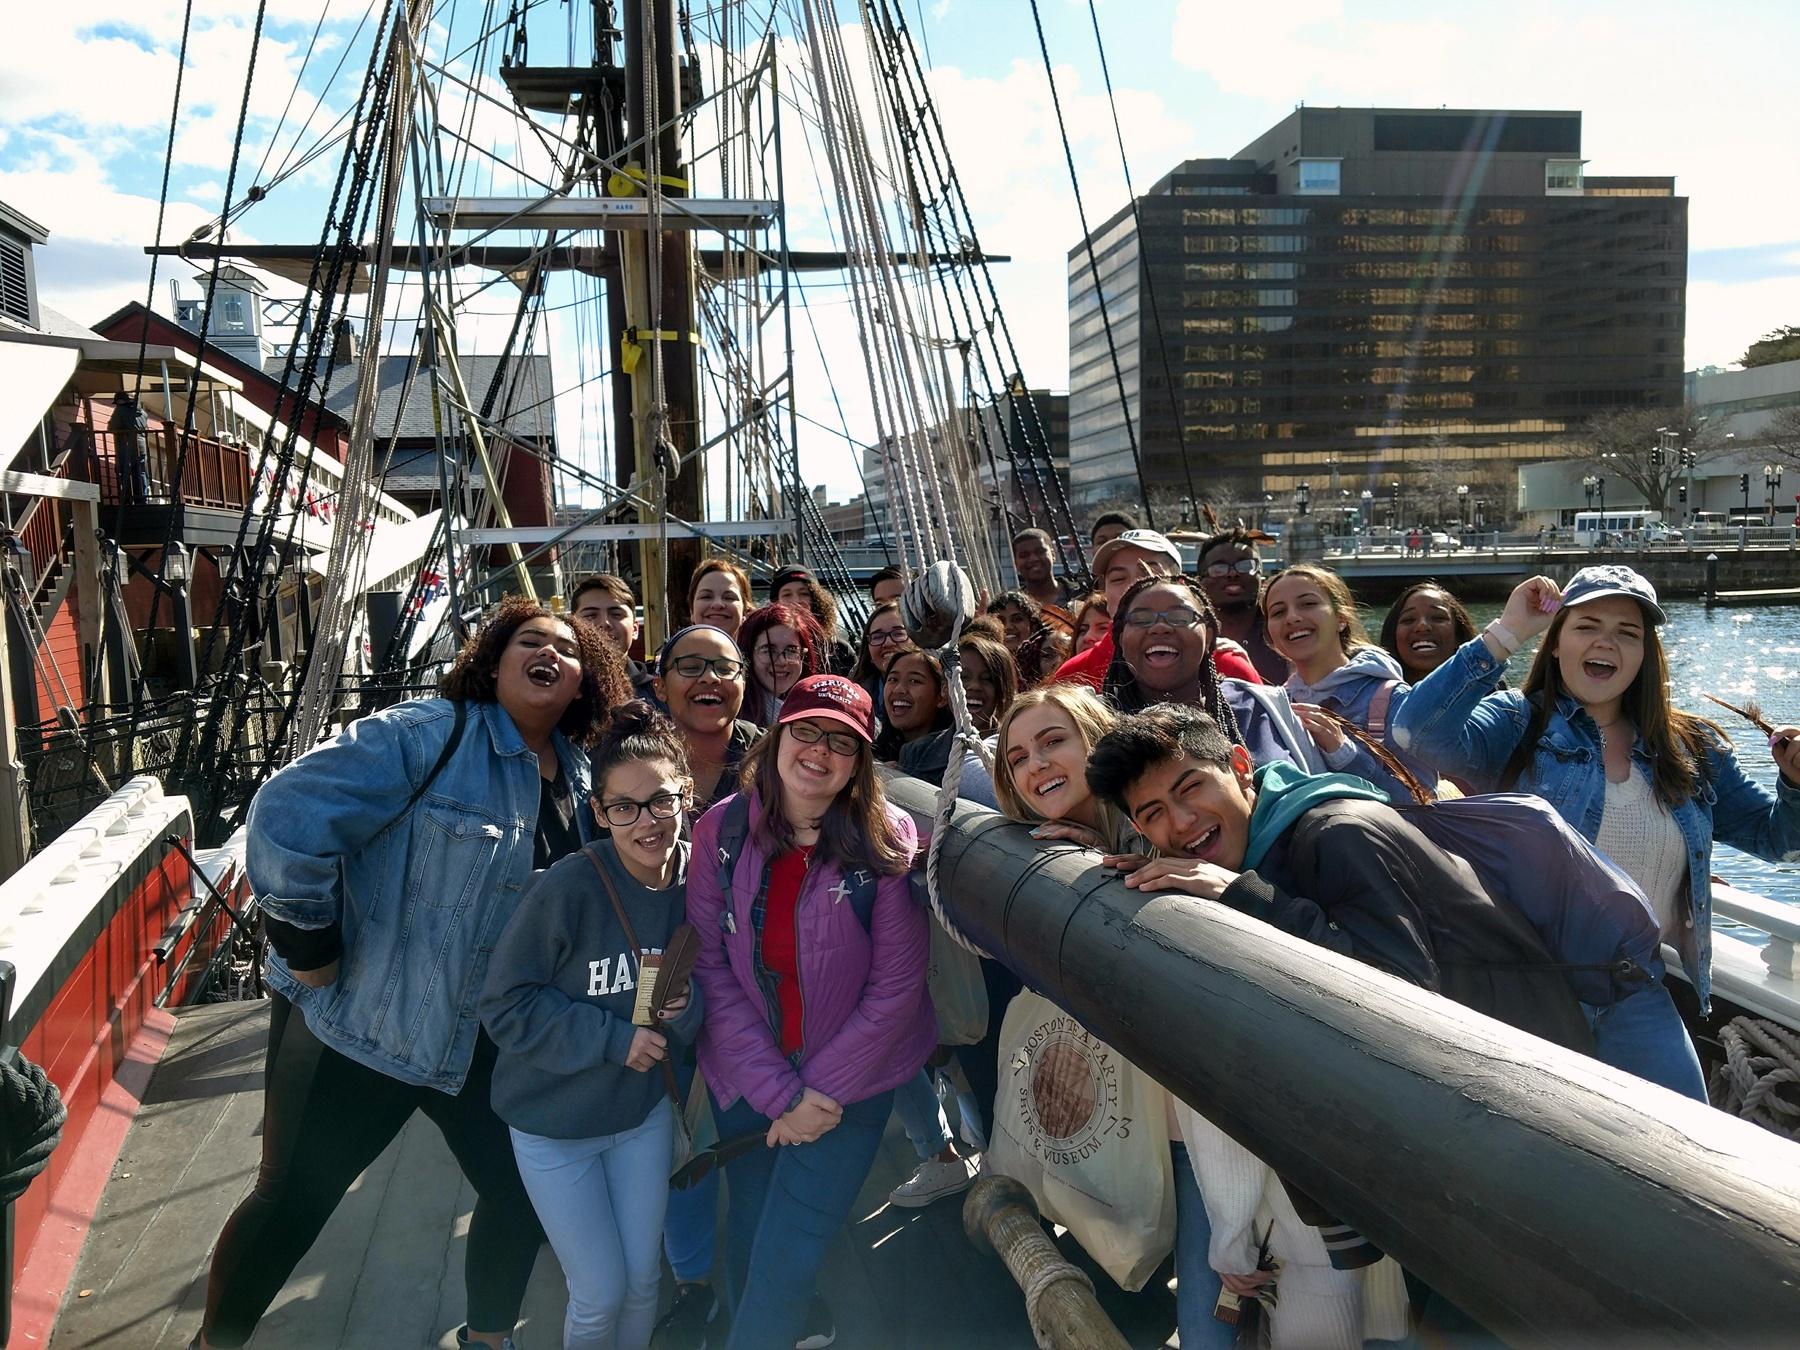 Student travel Boston harbor